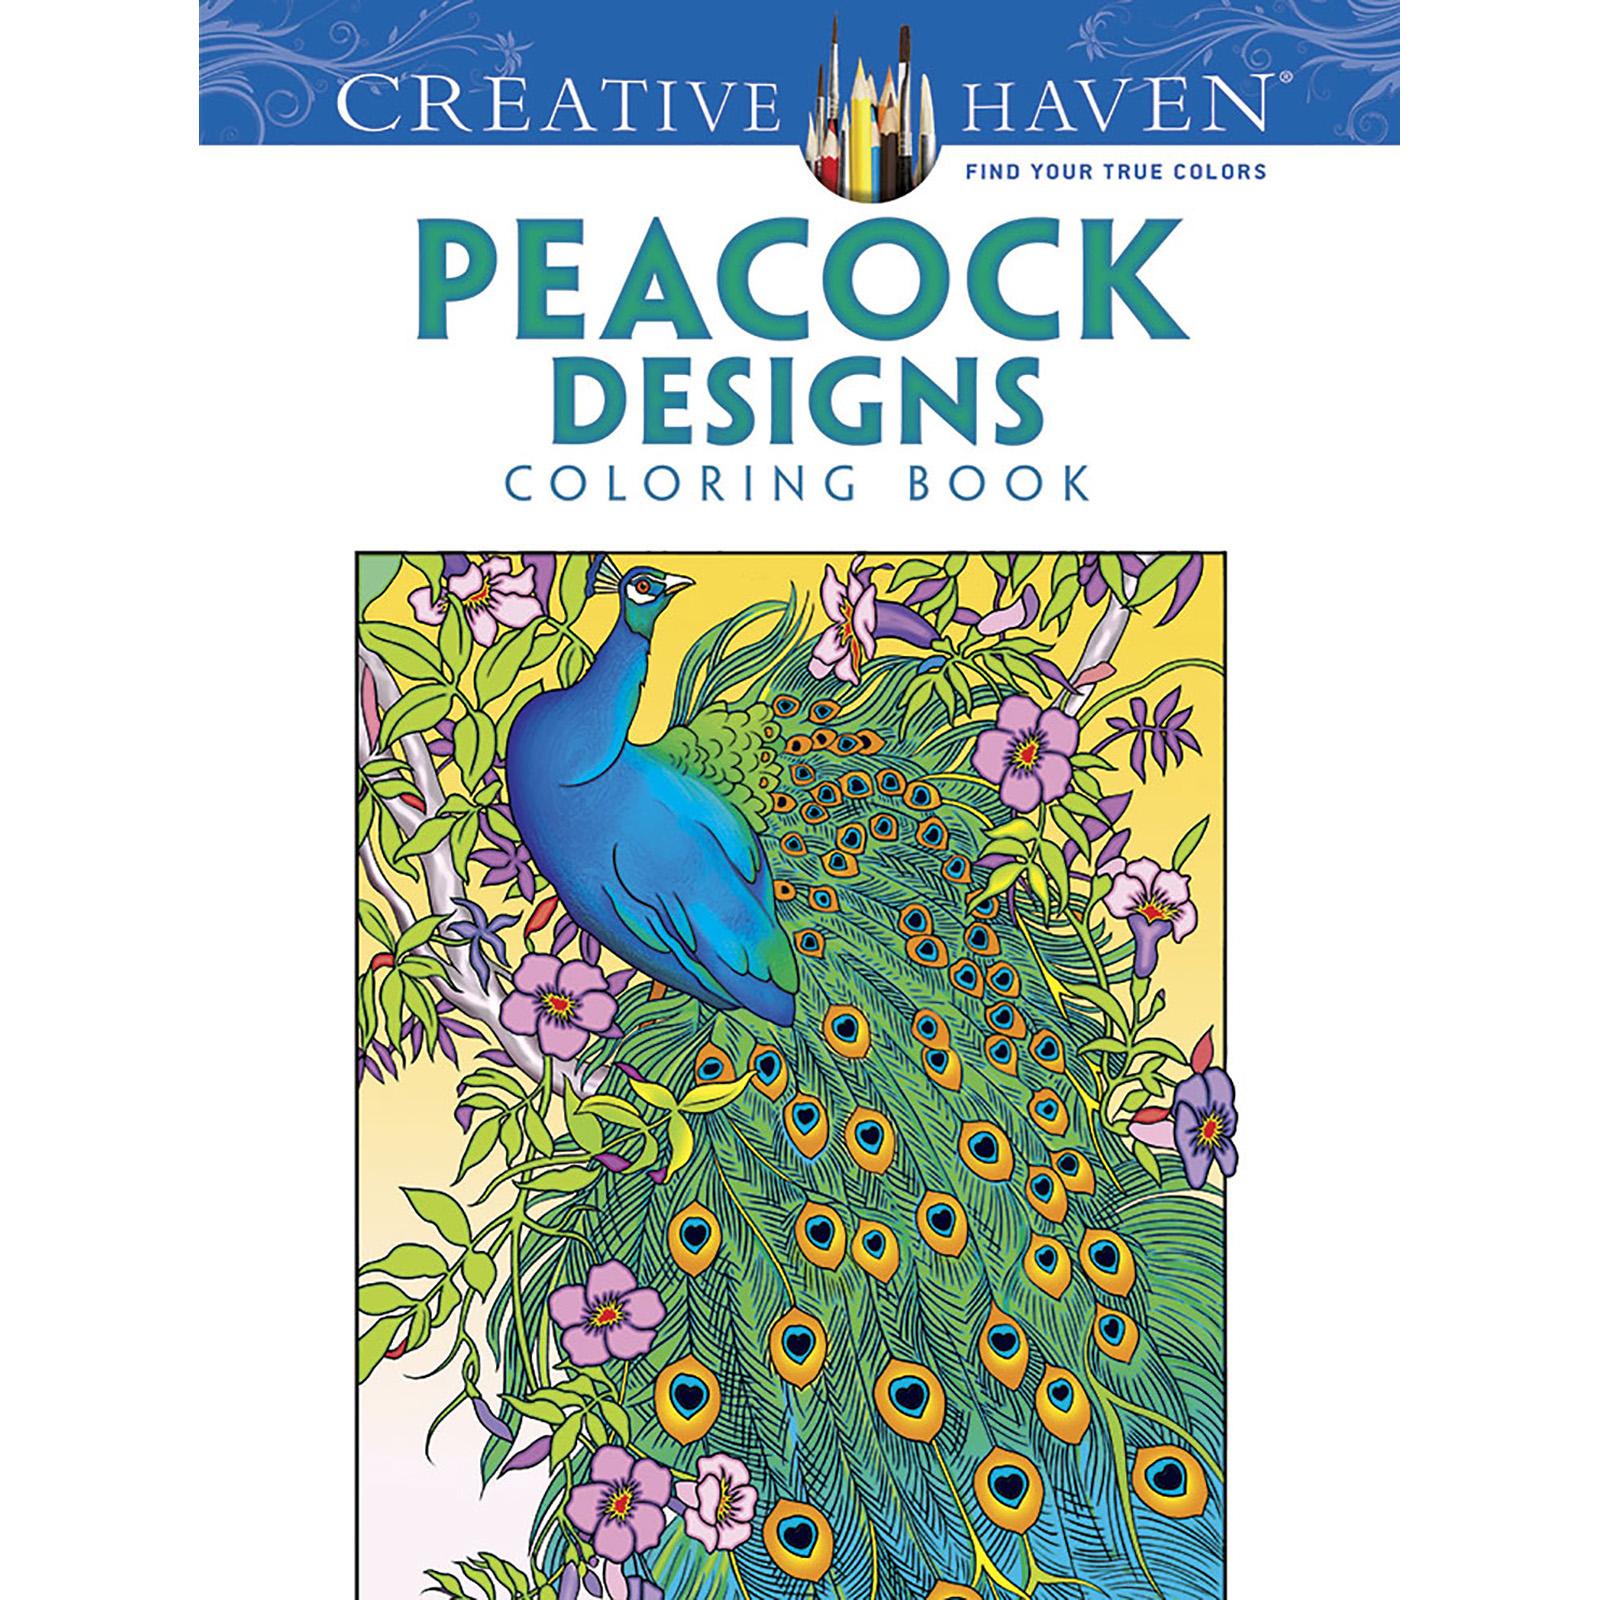 Creative Book Page Design : Creative haven peacock designs coloring book